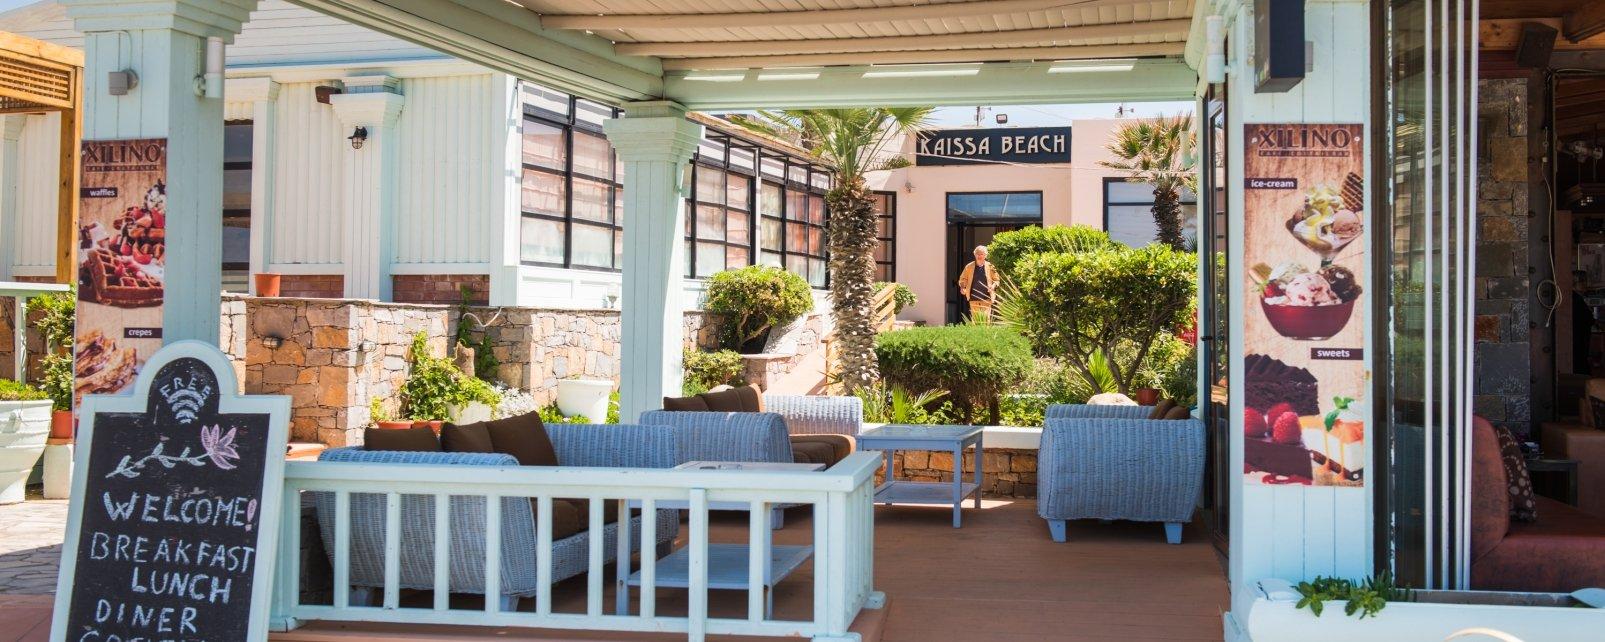 Hôtel Kaissa Beach